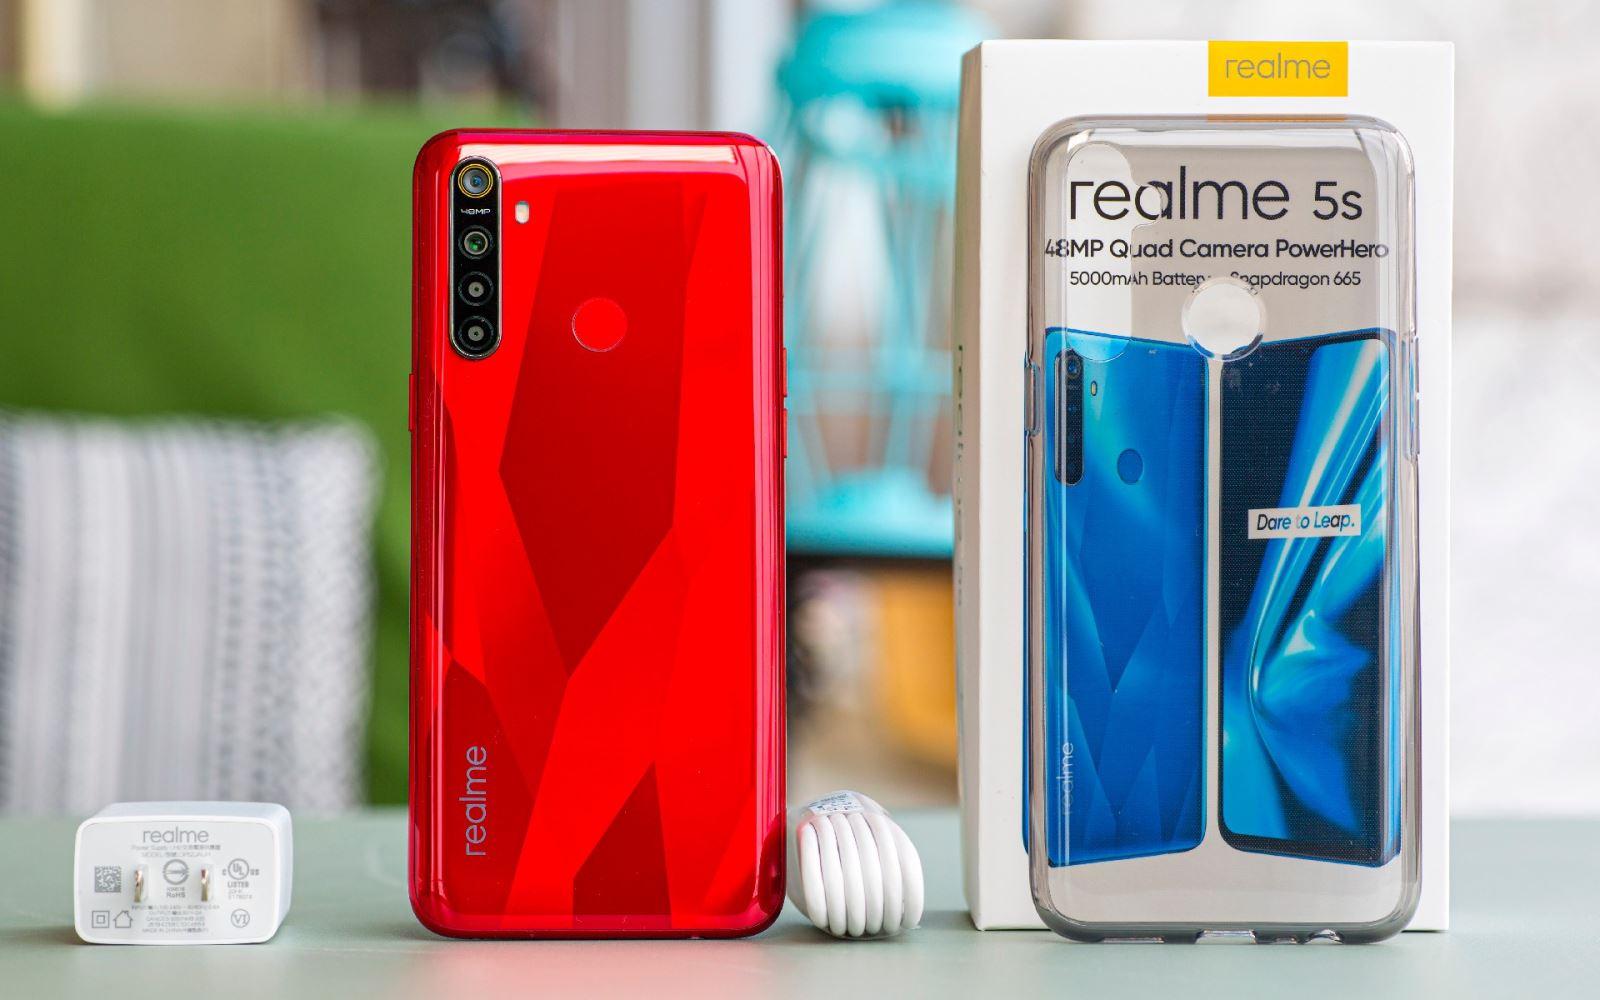 OPPO Realme 5s: Kẻ hủy diệt phân khúc giá rẻ